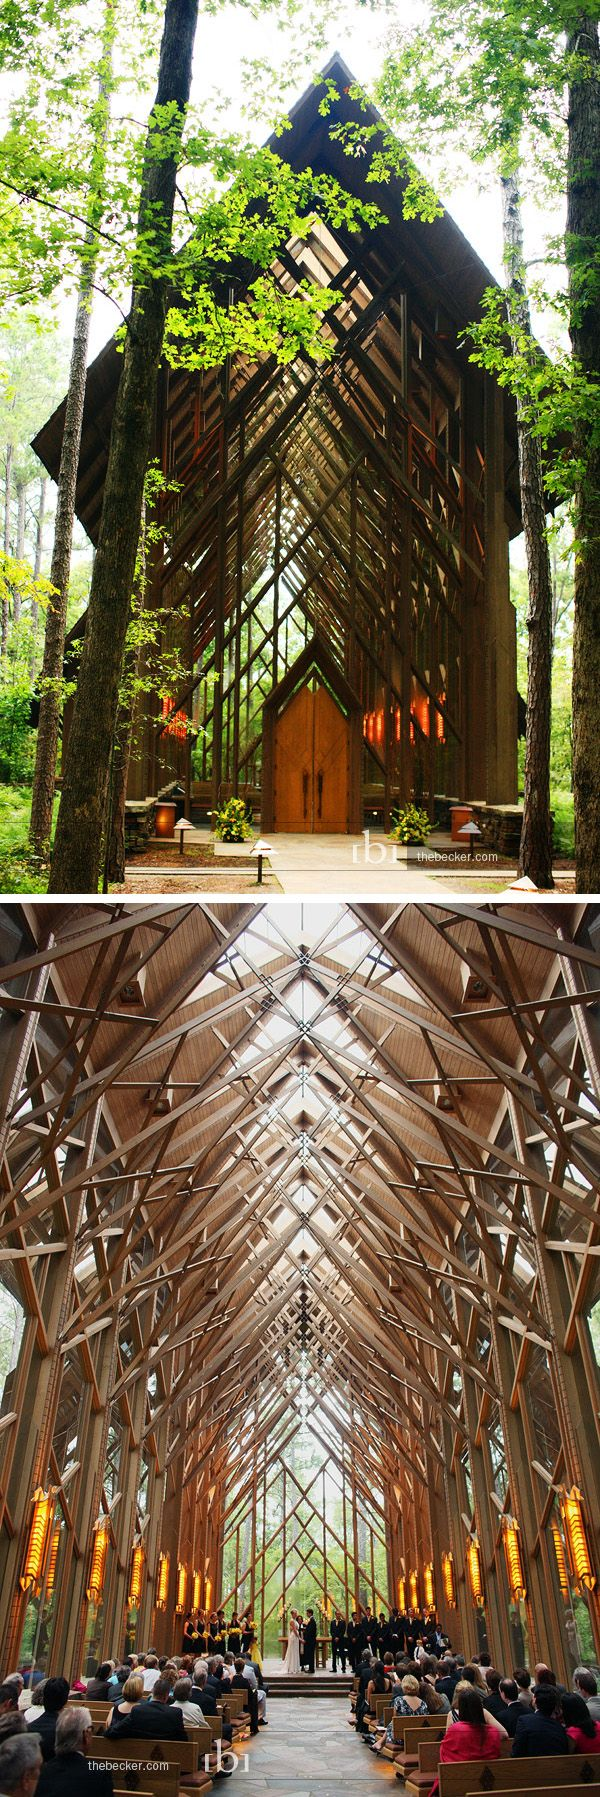 Amazing Wedding Chapel In The Woods Garvan Woodland Gardens Near Hot Springs Arkansas